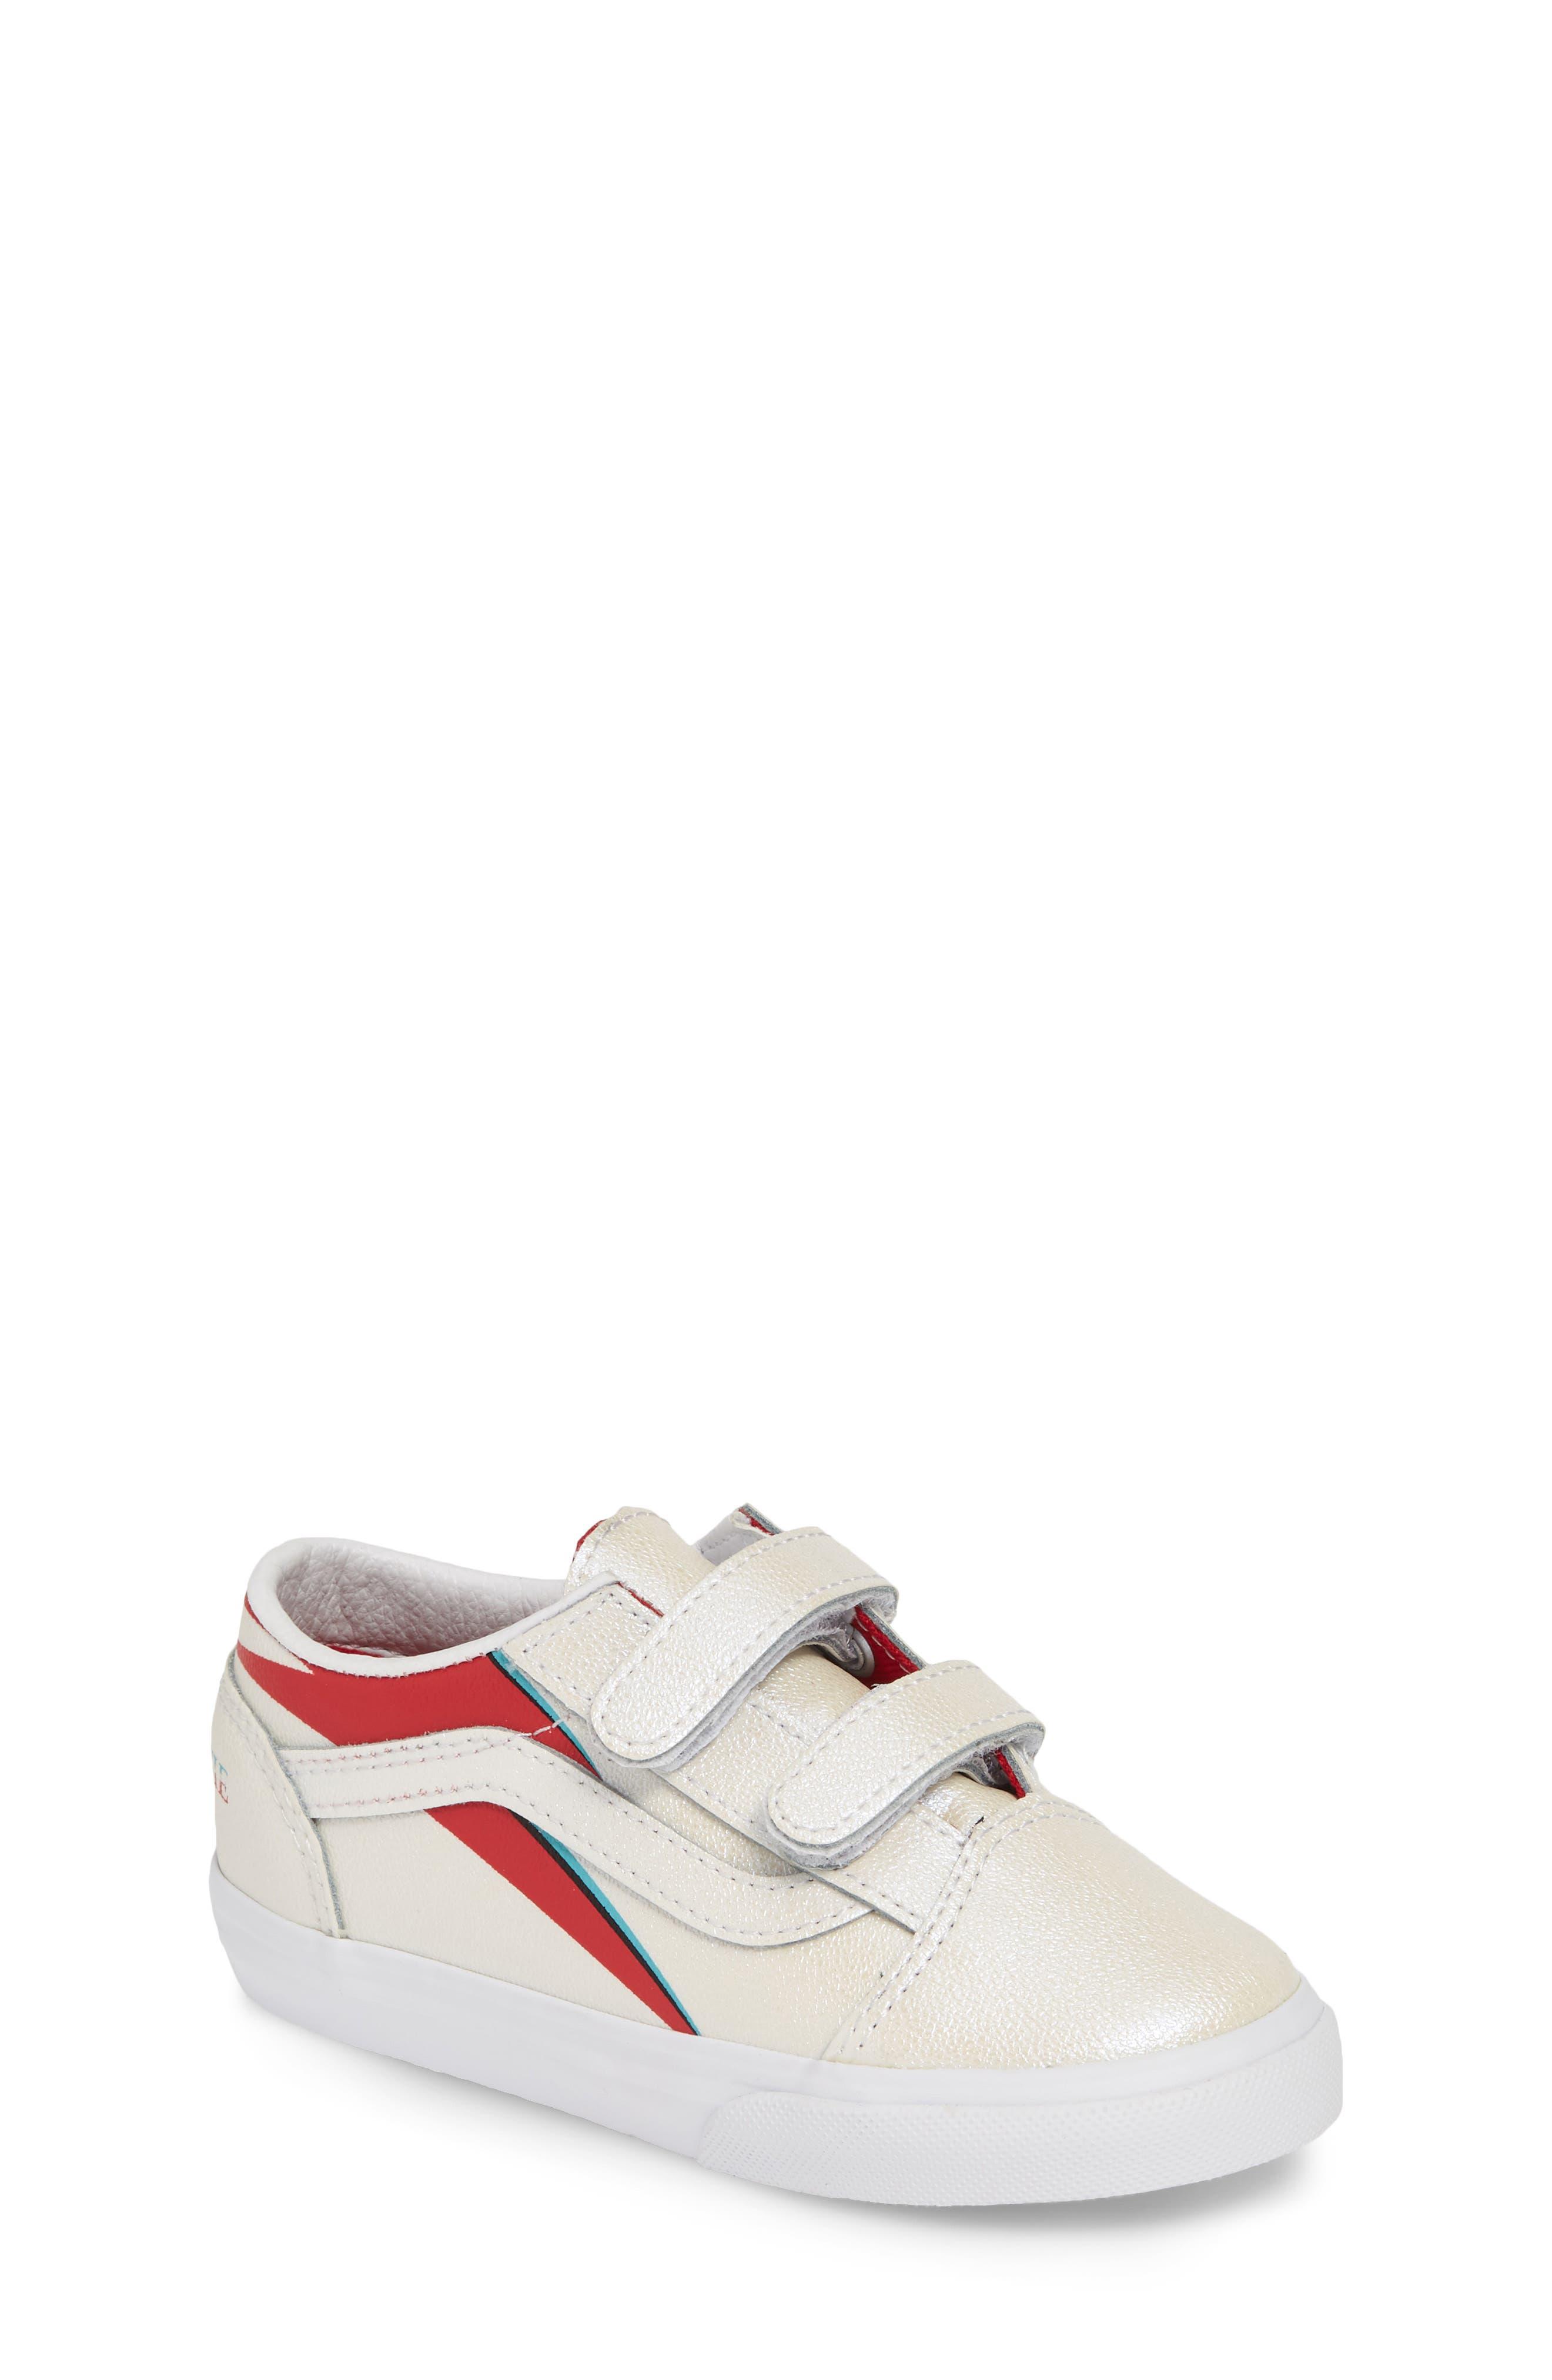 566ae73285 Toddler Vans Old Skool V Sneaker Size 5 M Blue